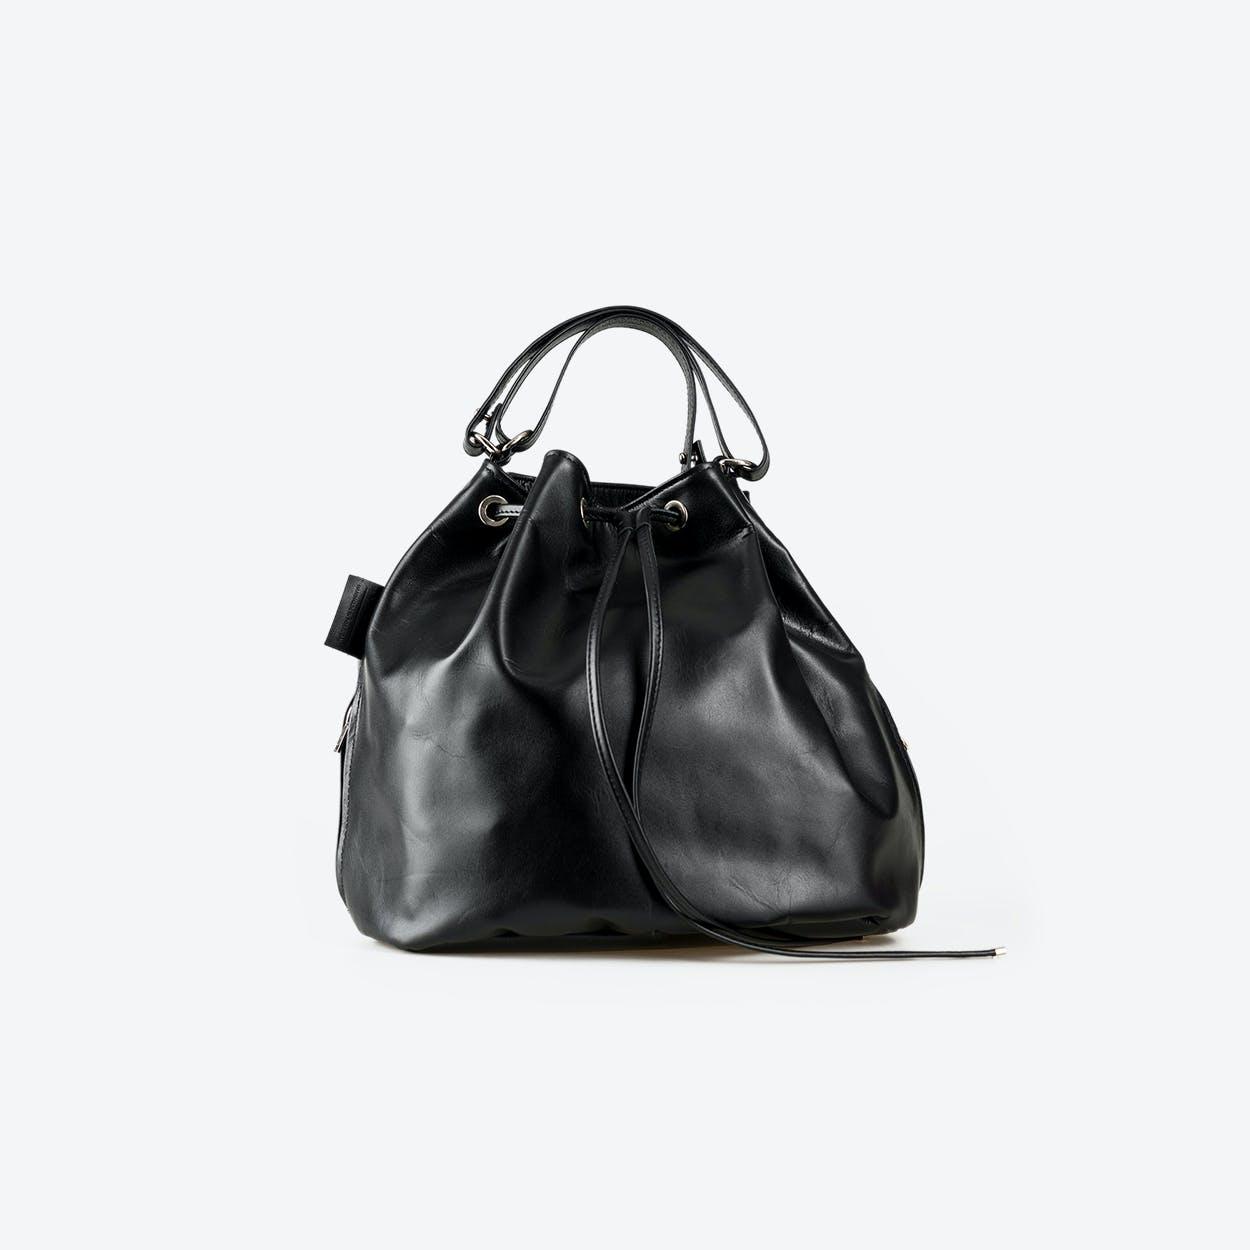 PRUNA Black Leather Tote Bag